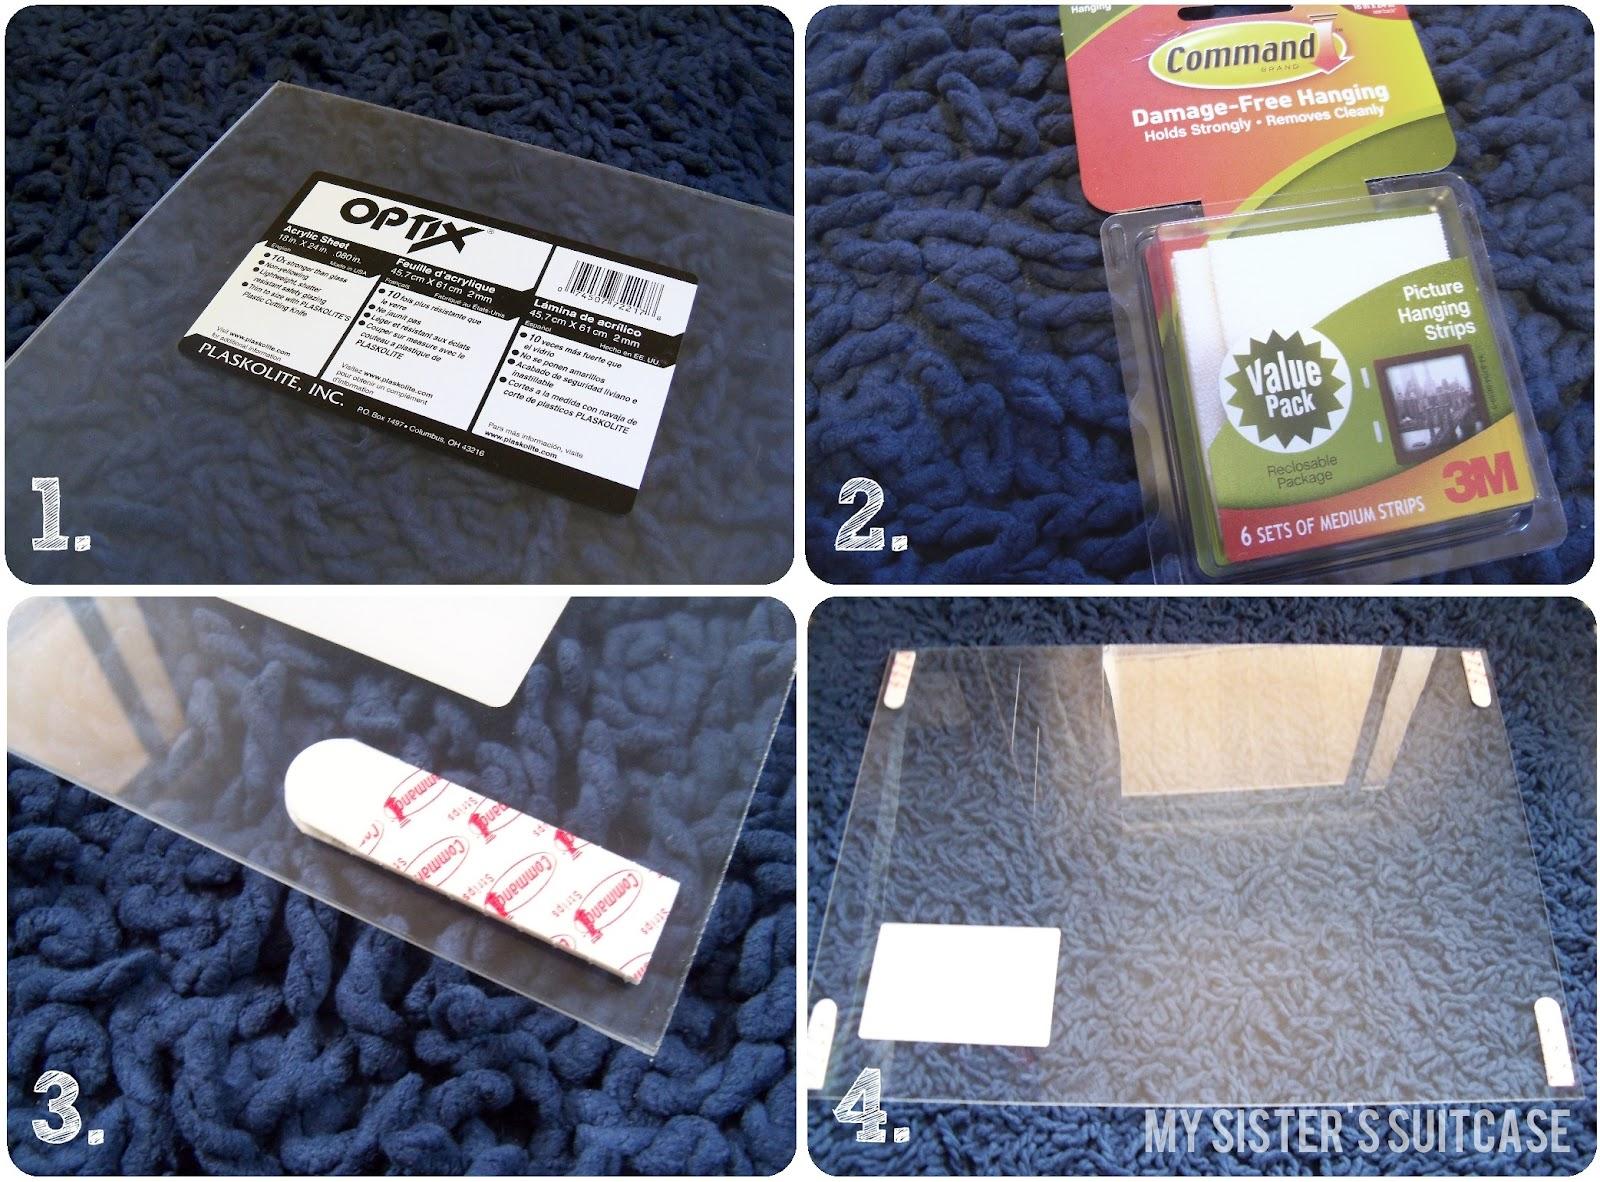 http://1.bp.blogspot.com/-3d839u2iS6s/Tz3vO0h-EKI/AAAAAAAAA68/NCmY1D90uyQ/s1600/dry+erase+board_materials.jpg